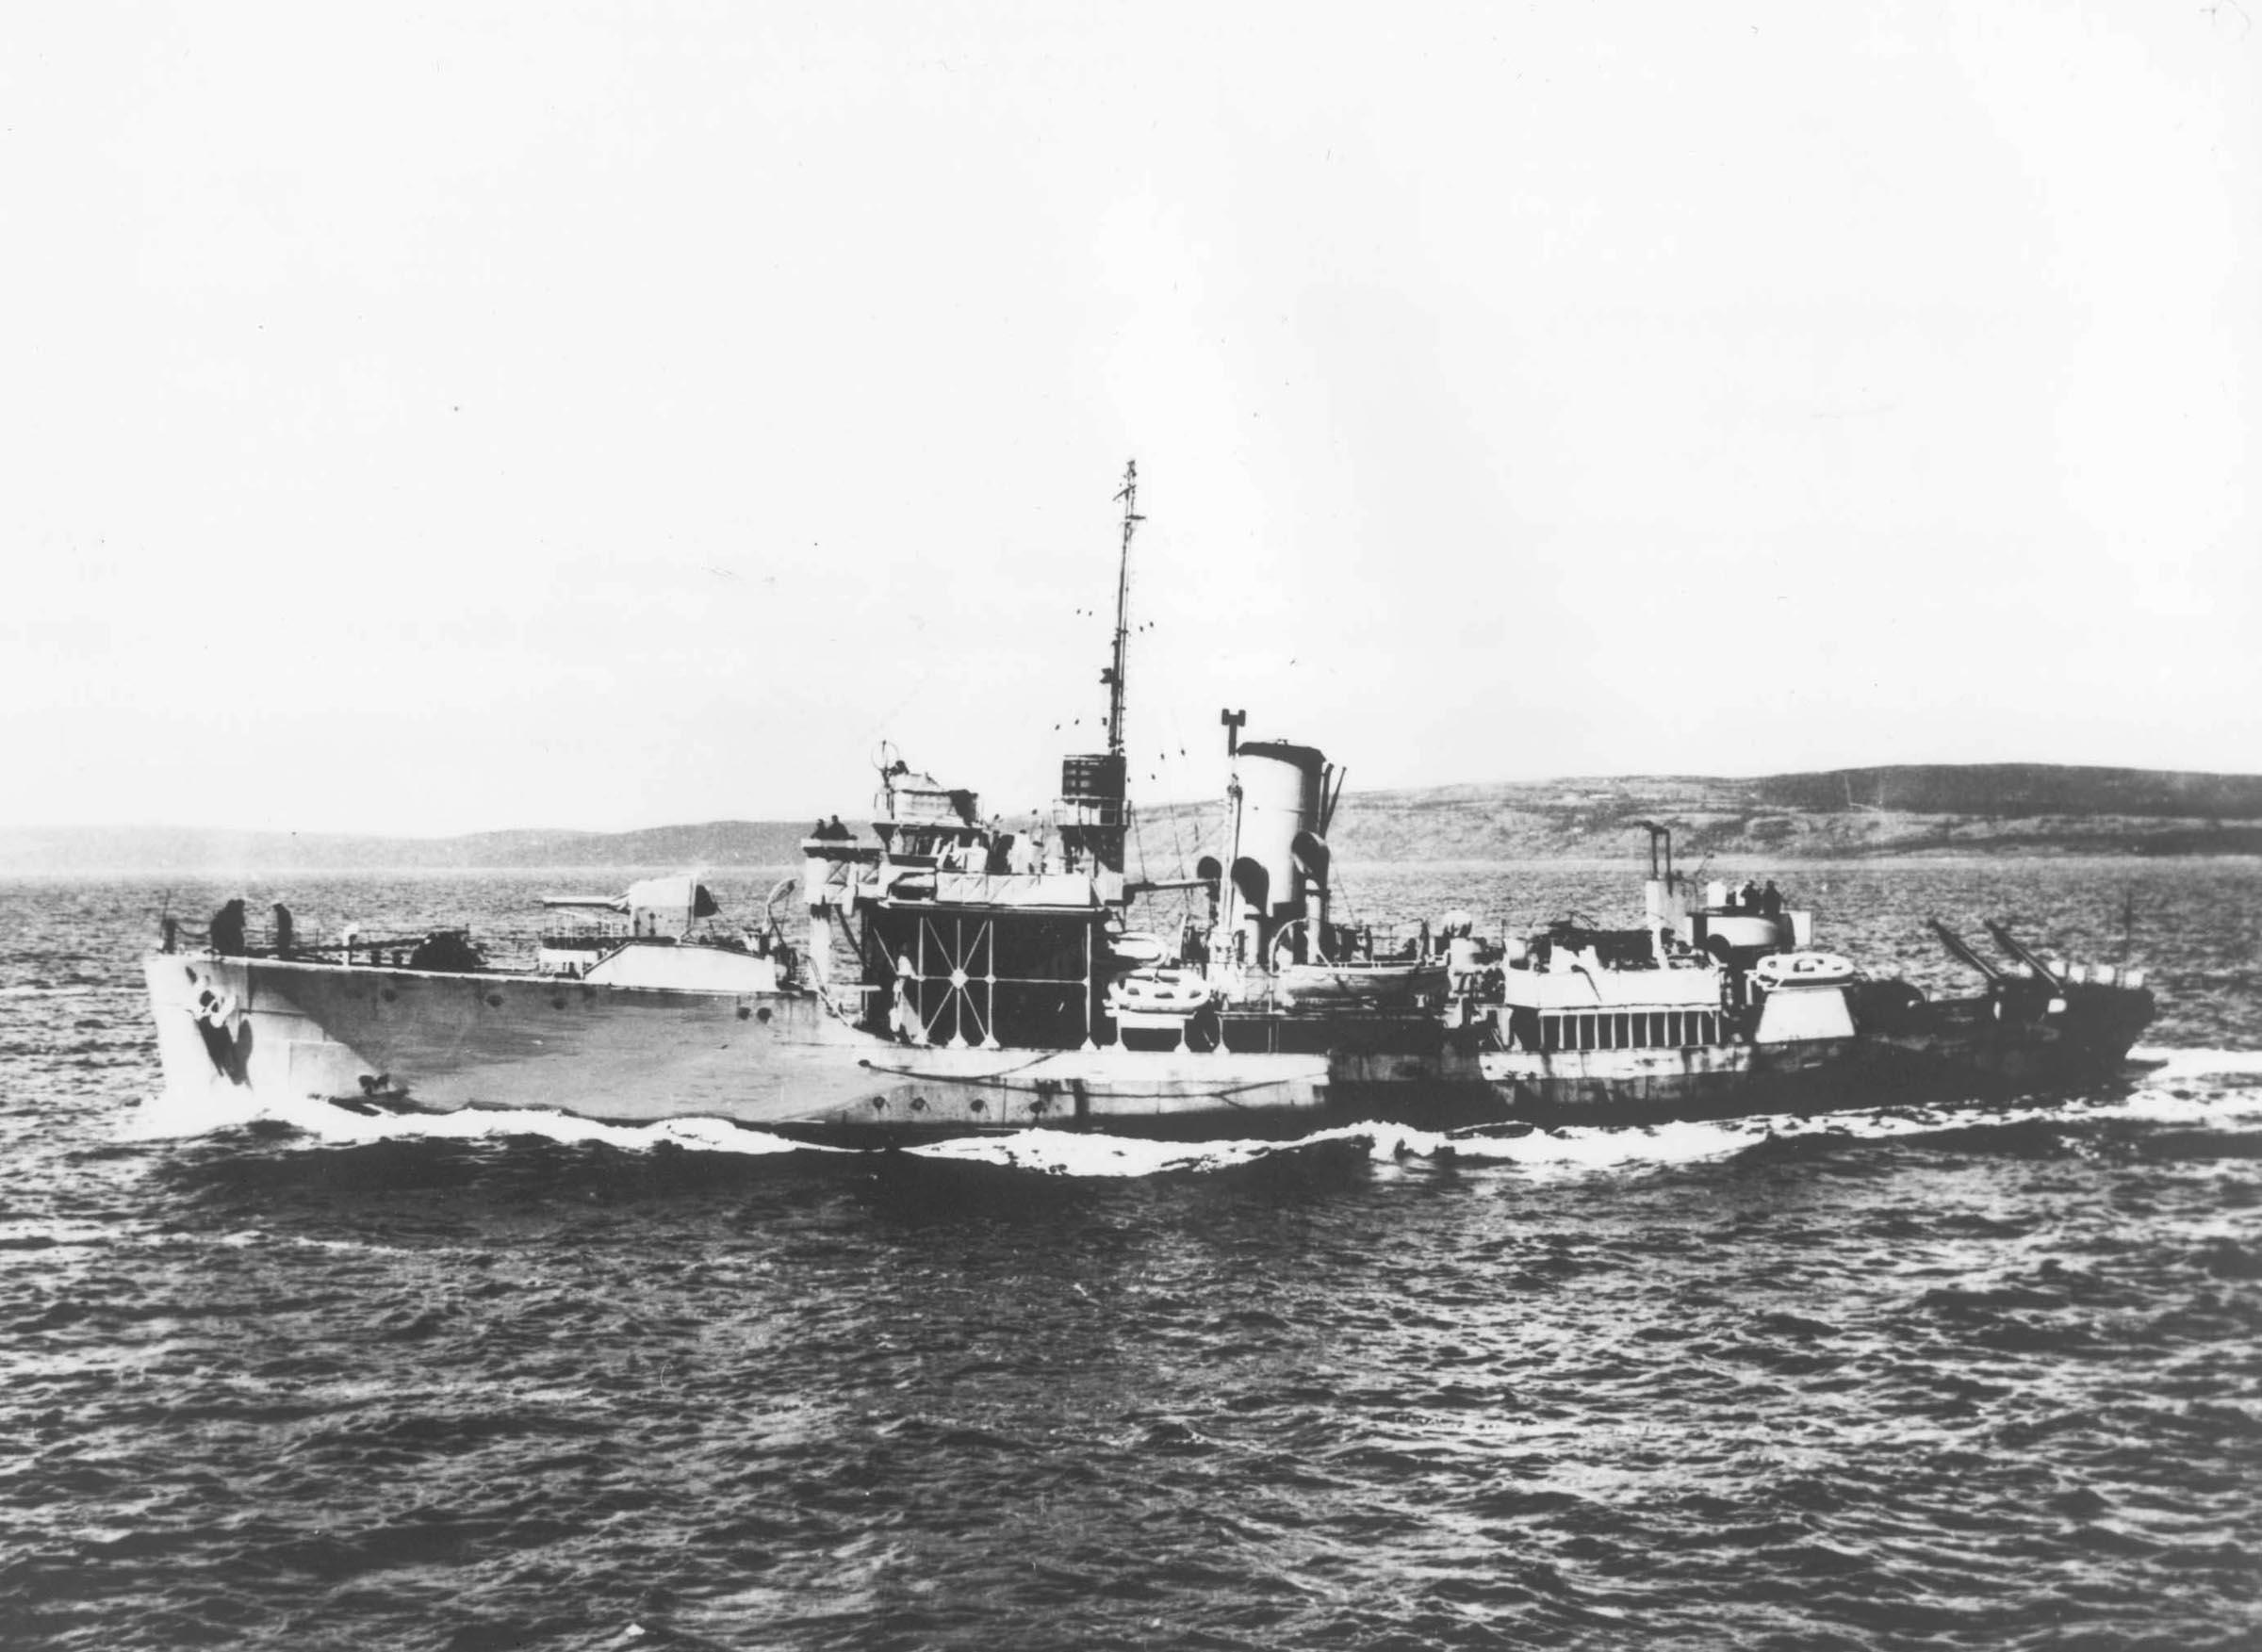 HMCS ALBERNI